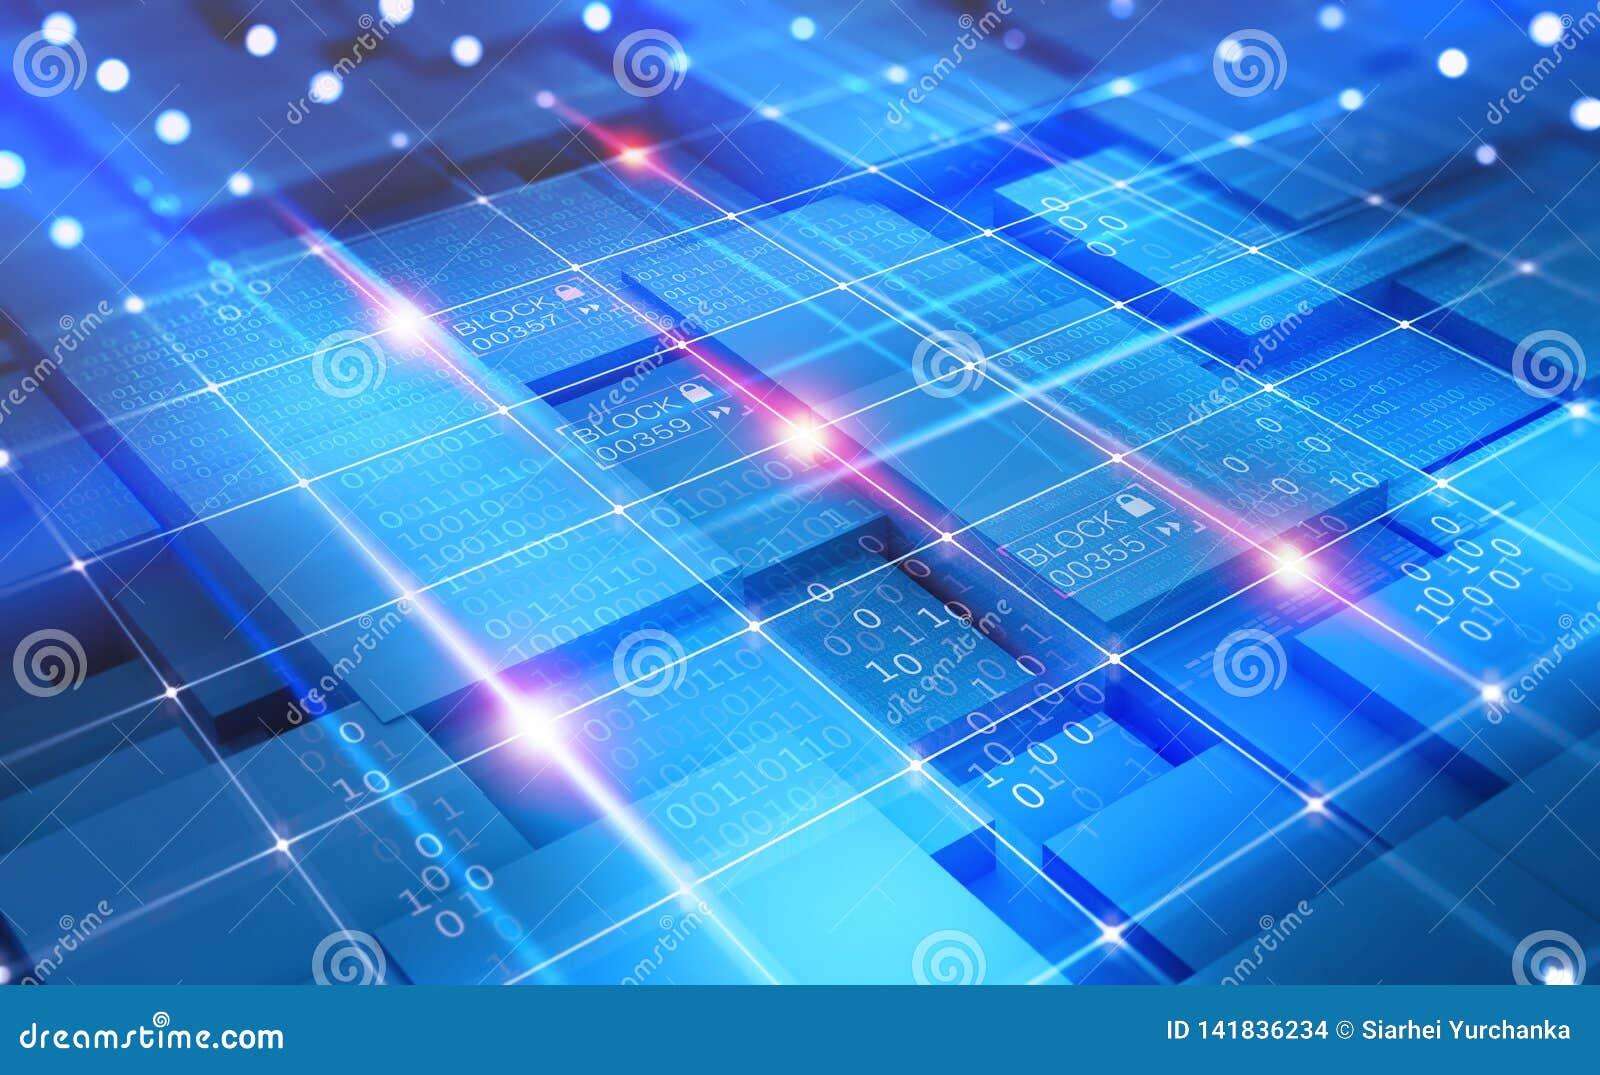 Cyberspace abstract concept. Blockchain network. Fintech technology